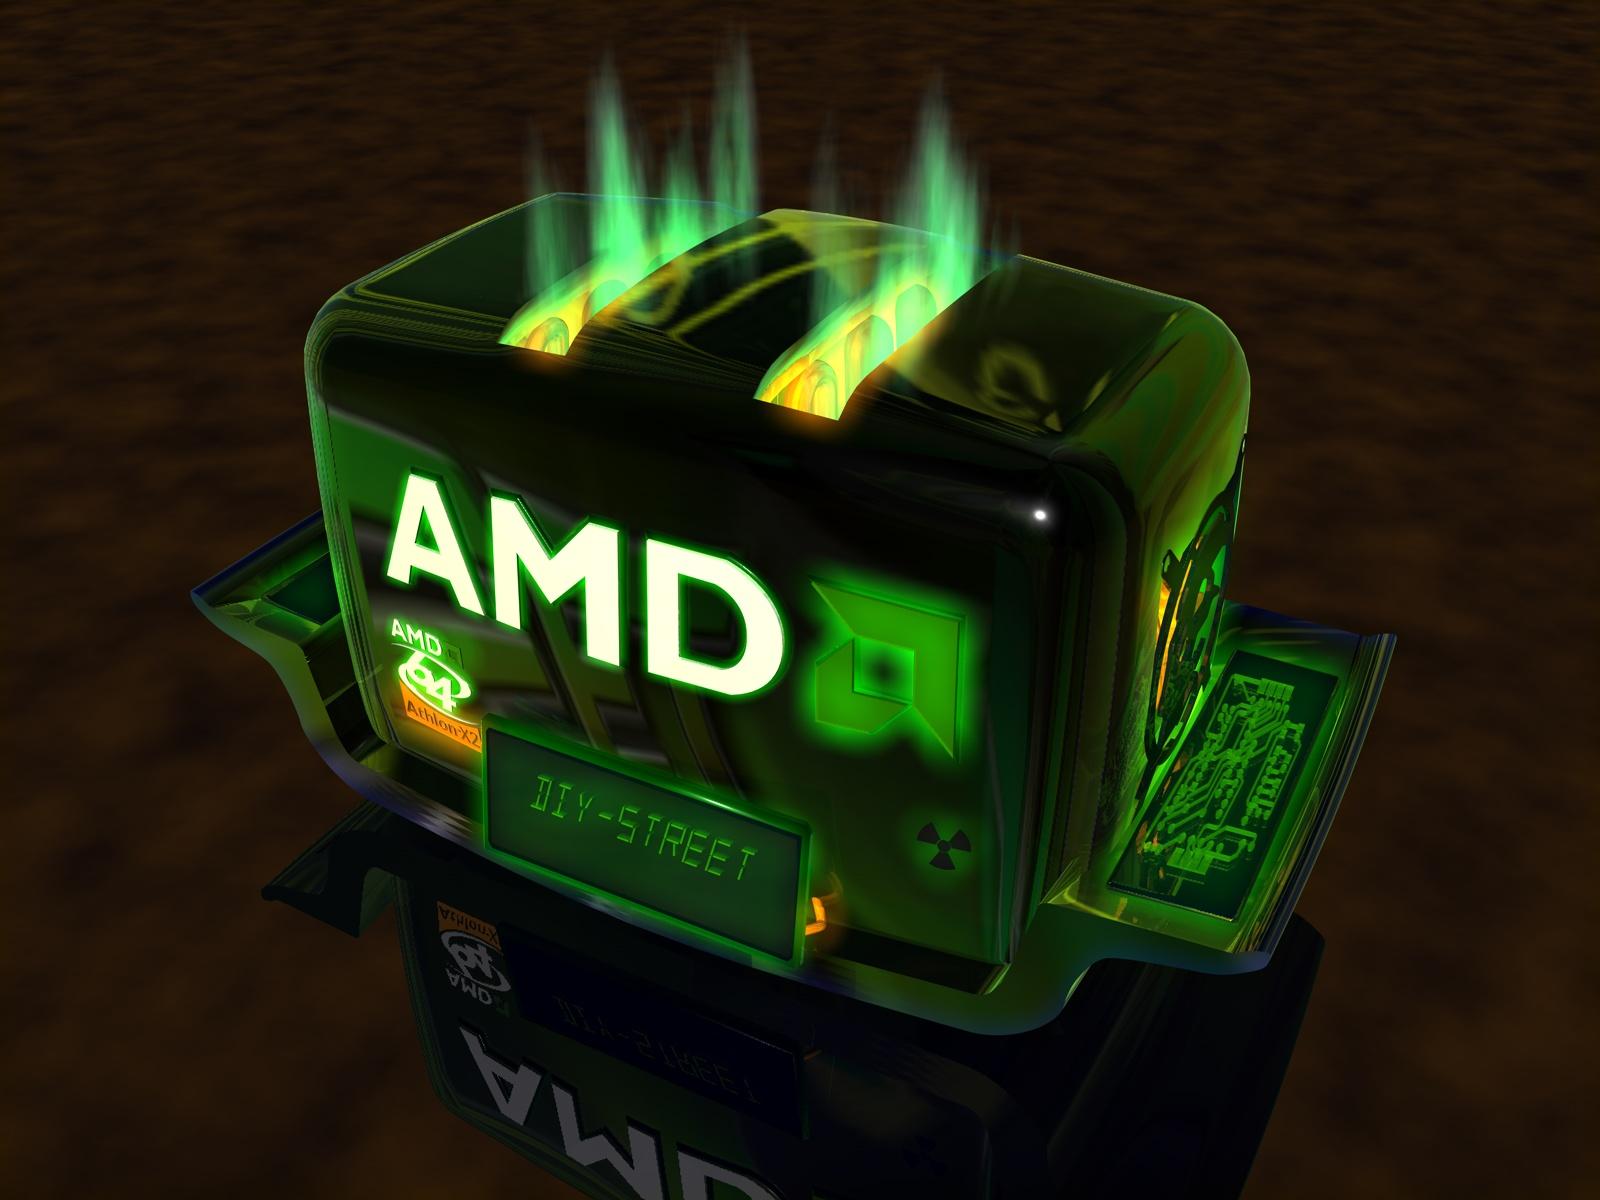 AMD Sempron wallpapers | AMD Sempron stock photos